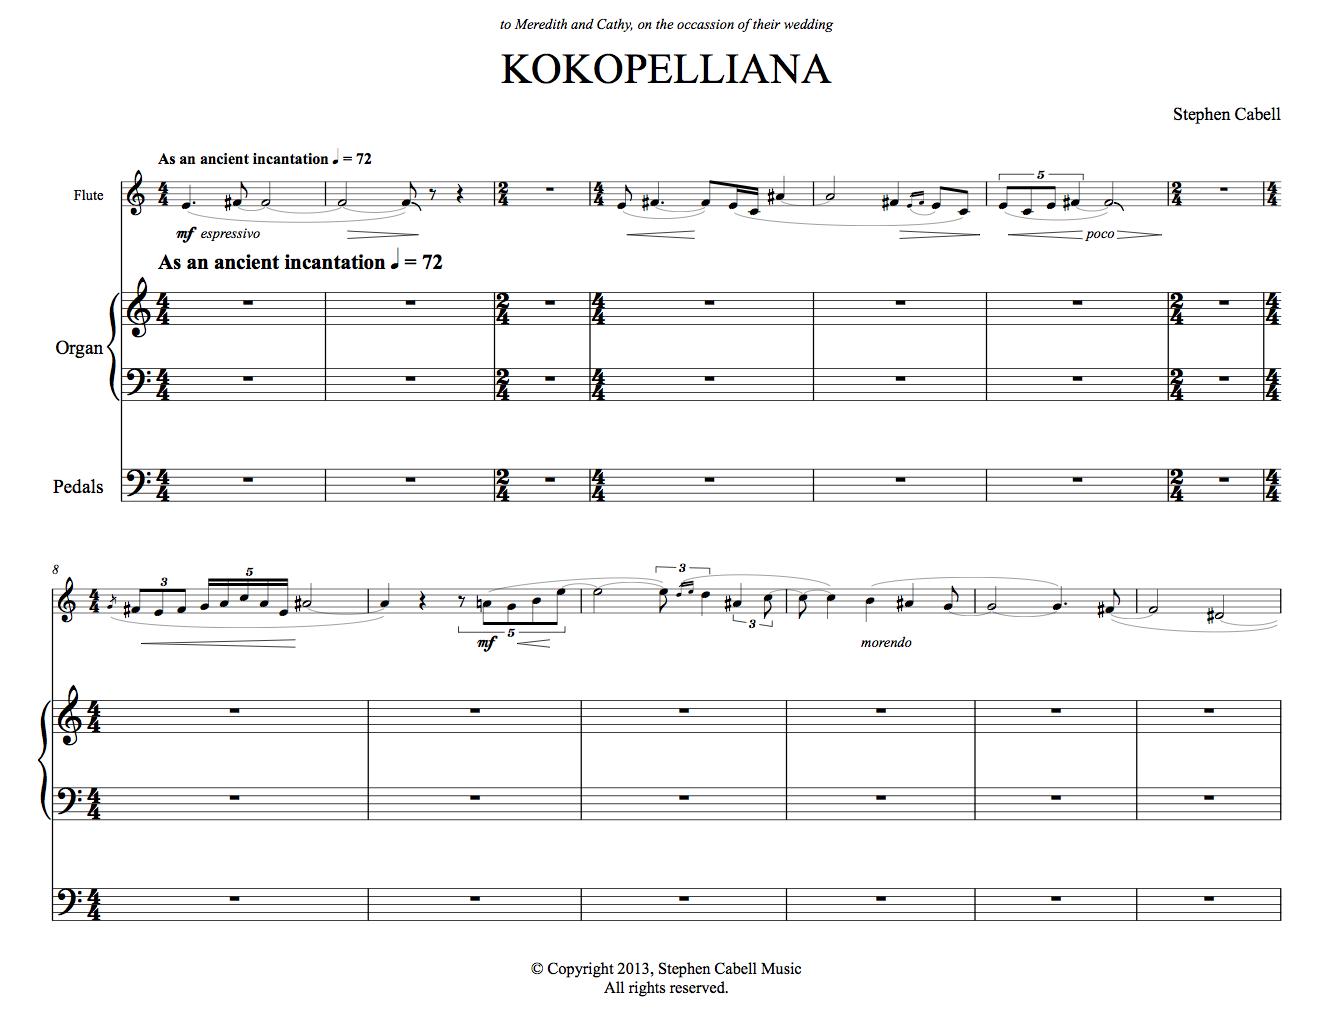 KOKOPELLIANA full score: page 1